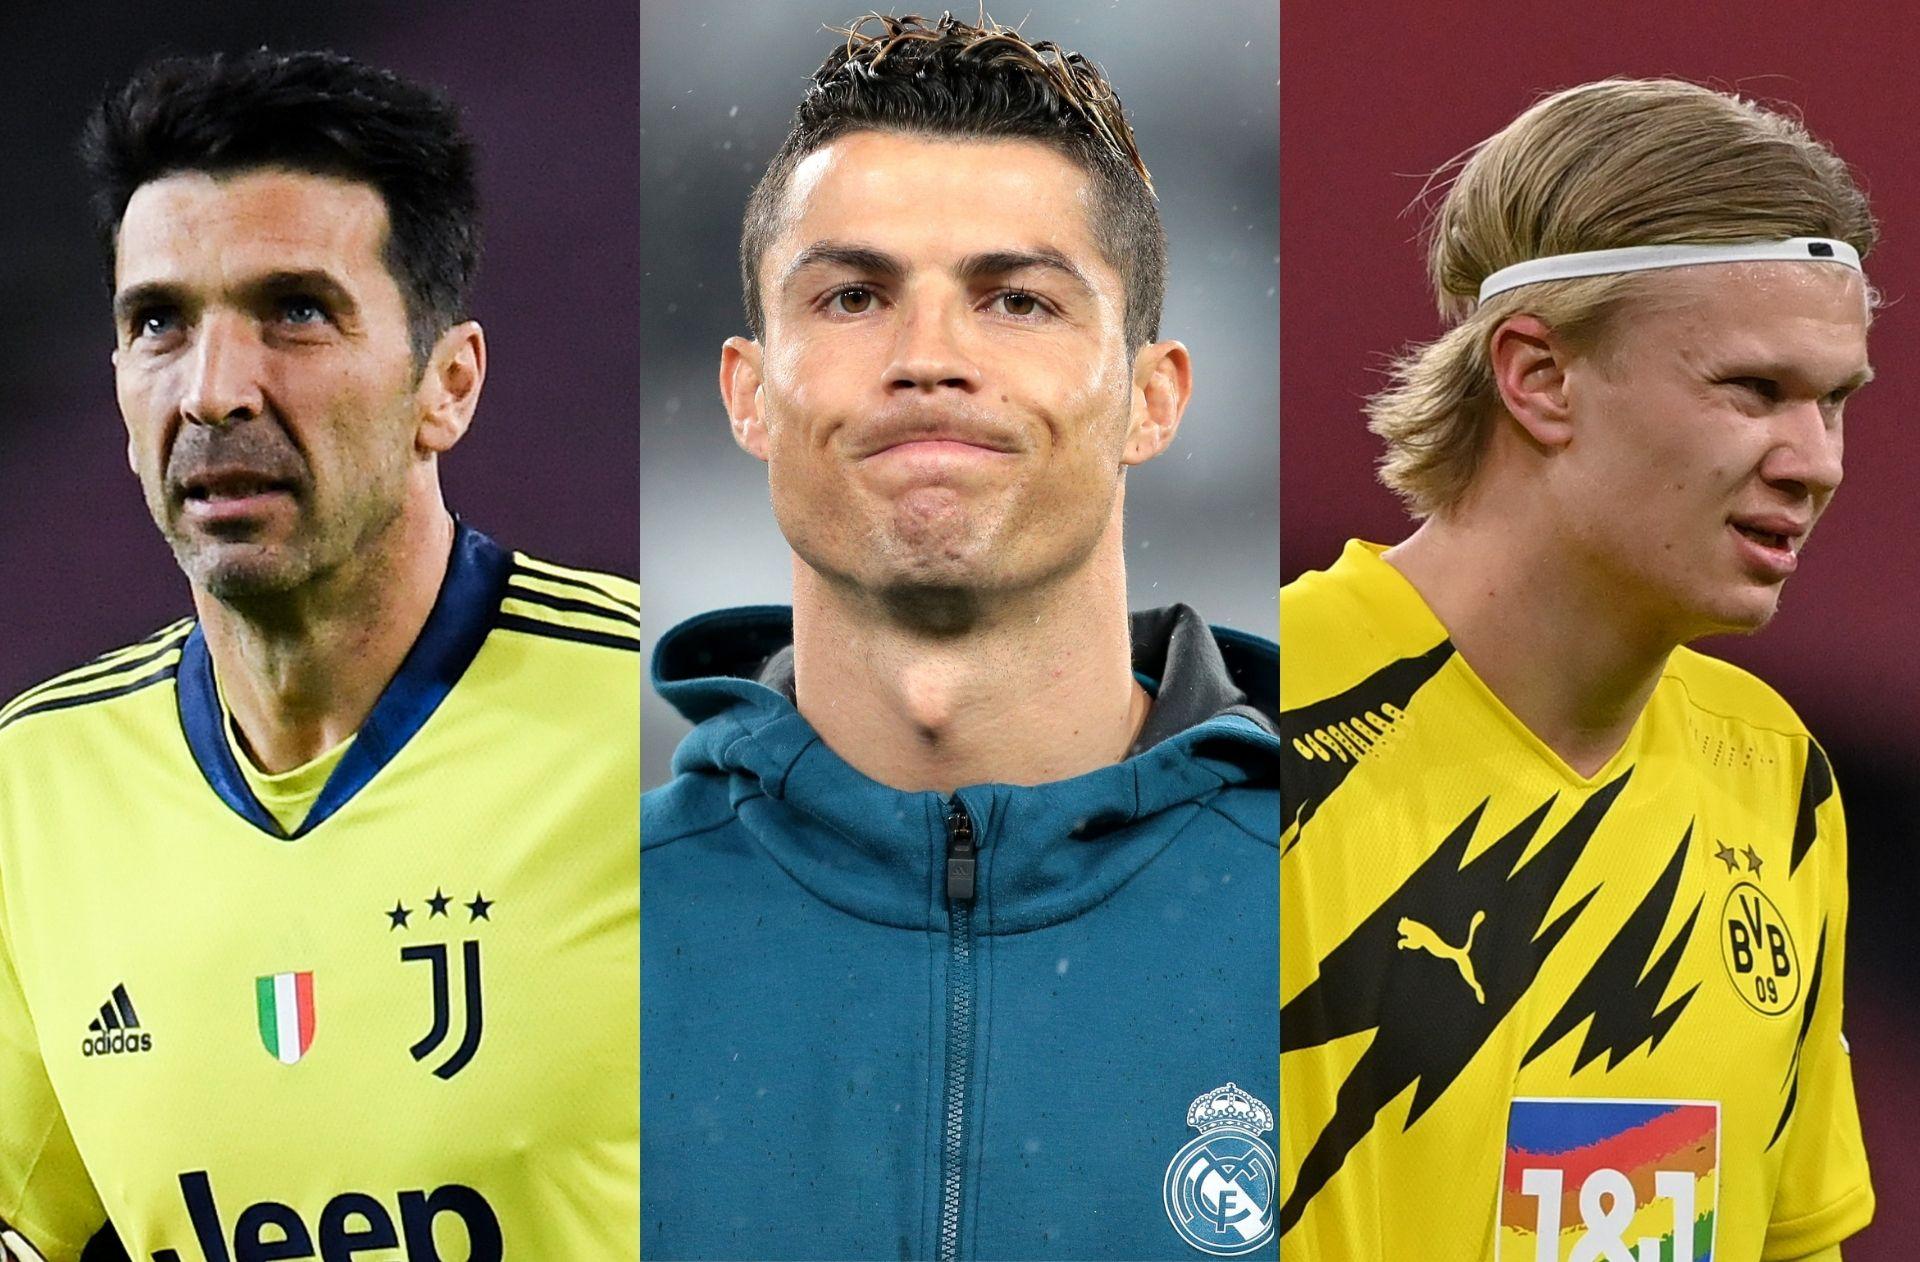 Saturday's transfer rumors - Real Madrid eye a trade deal for Ronaldo